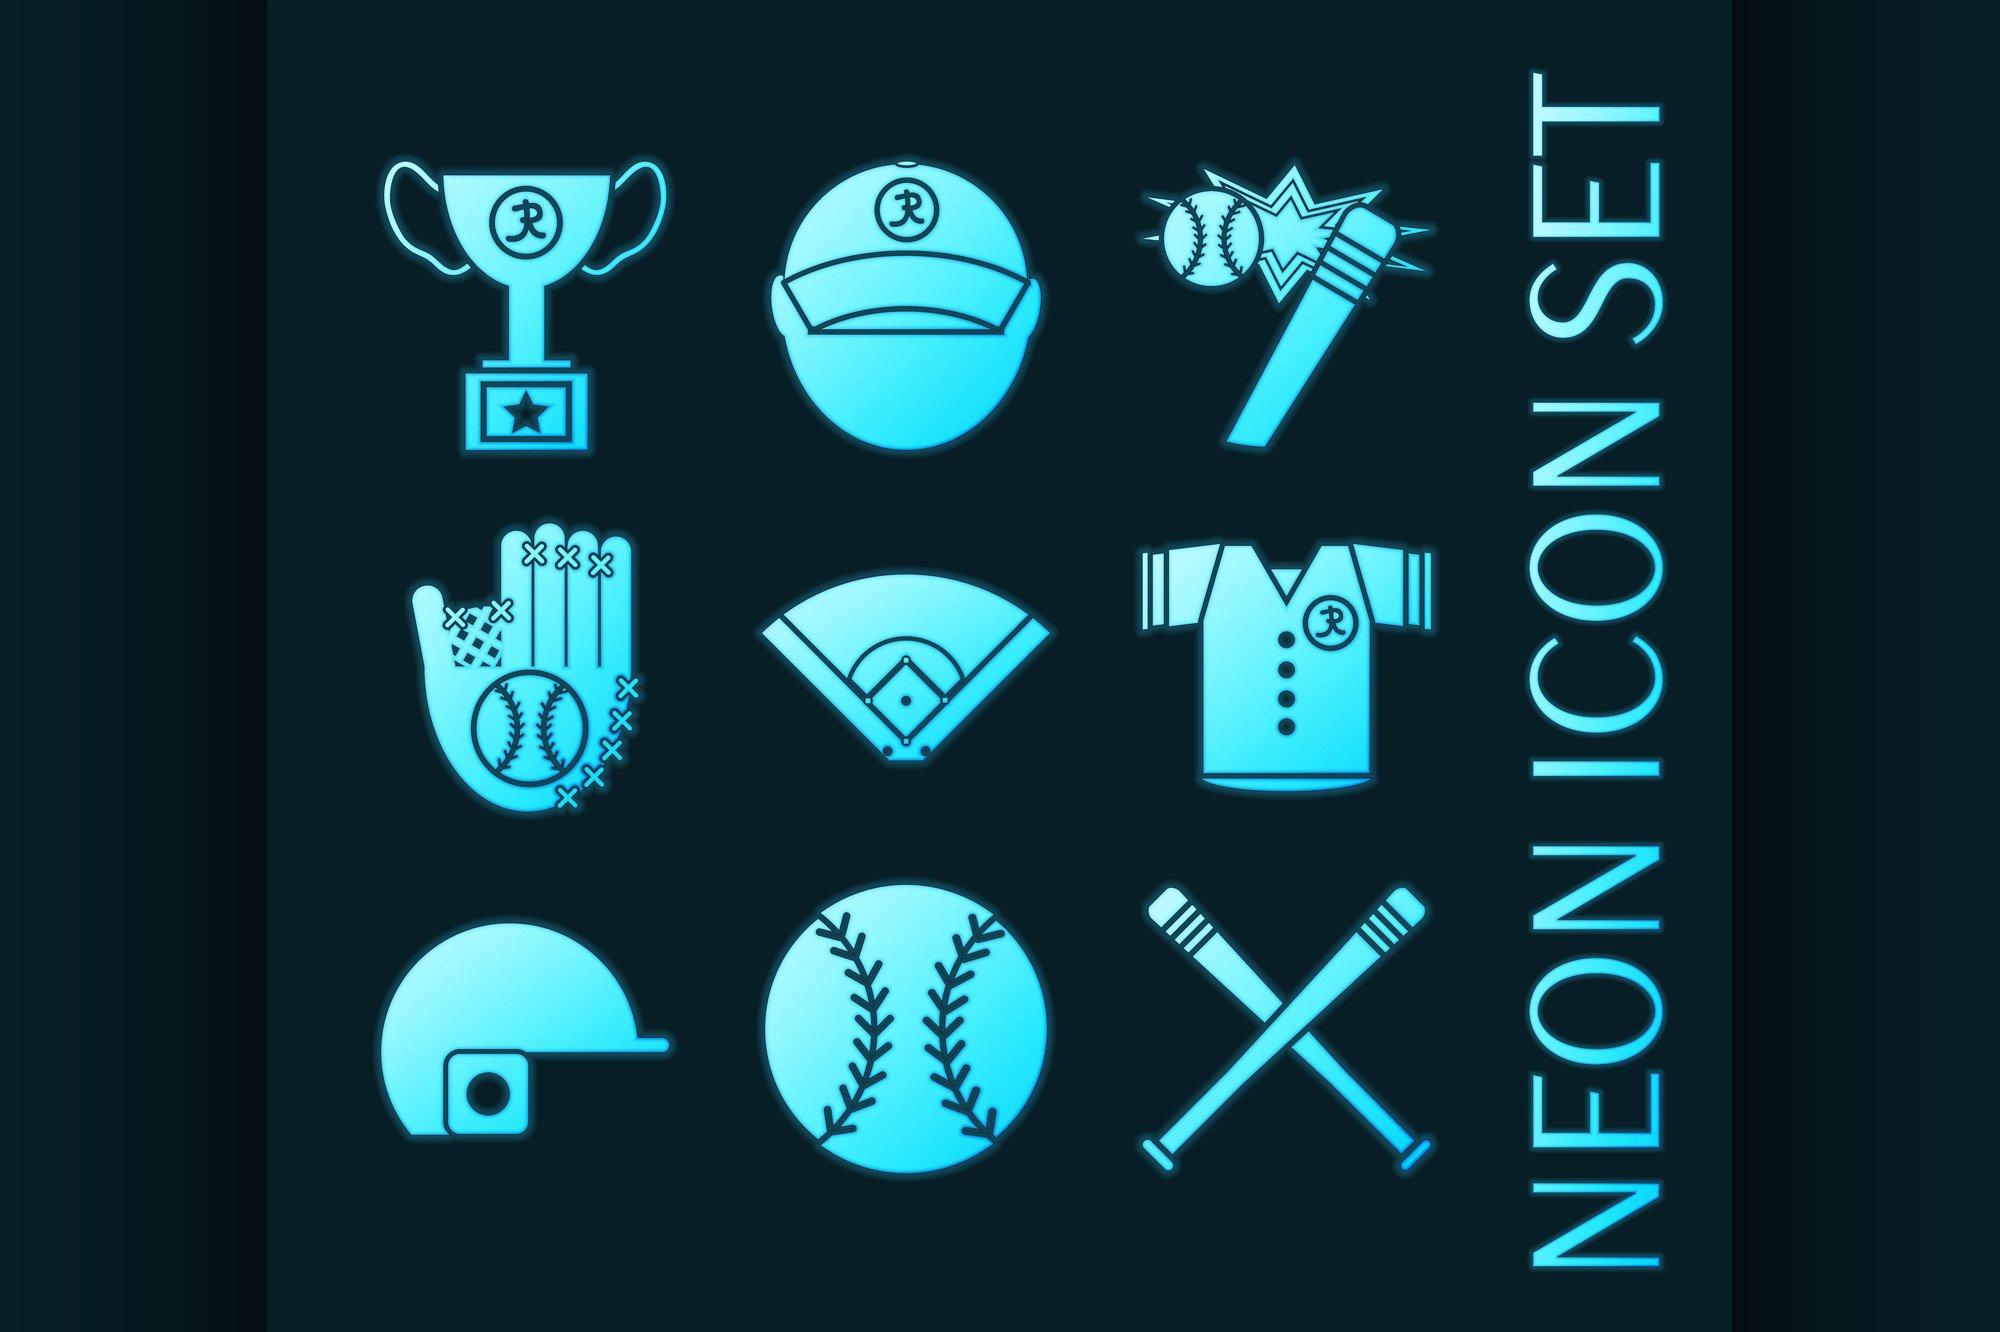 Set of Baseball glowing neon style icons example image 1